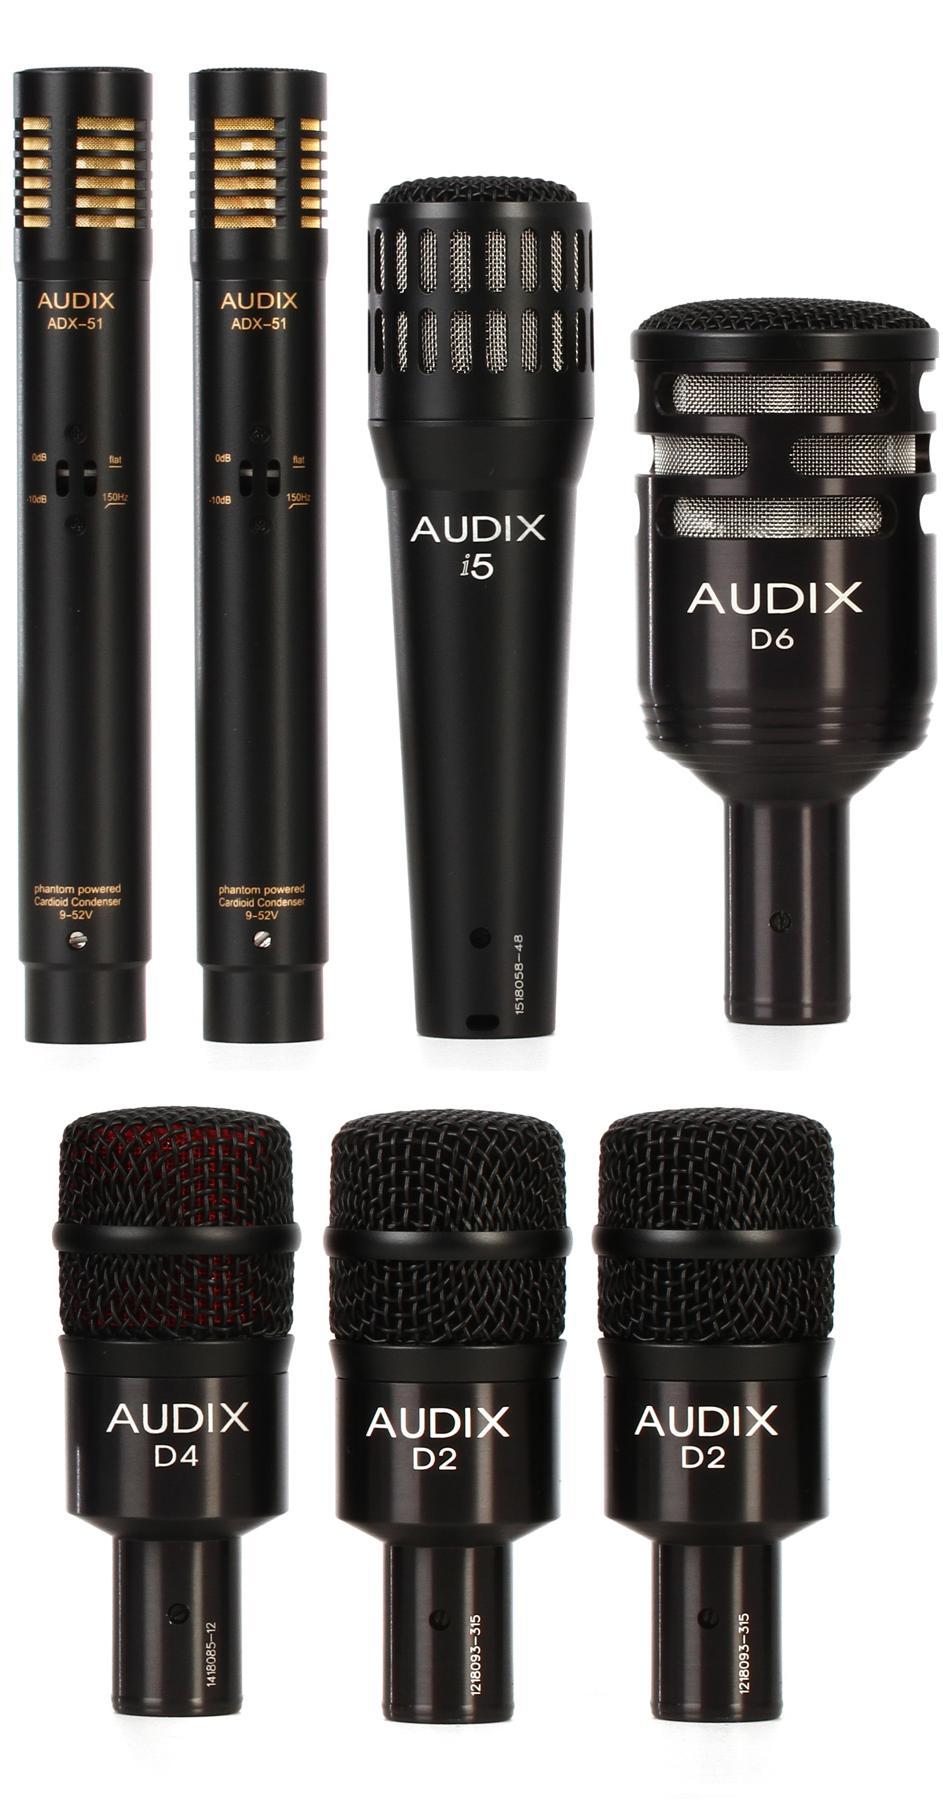 1. Audix DP7 Drum Microphone Set